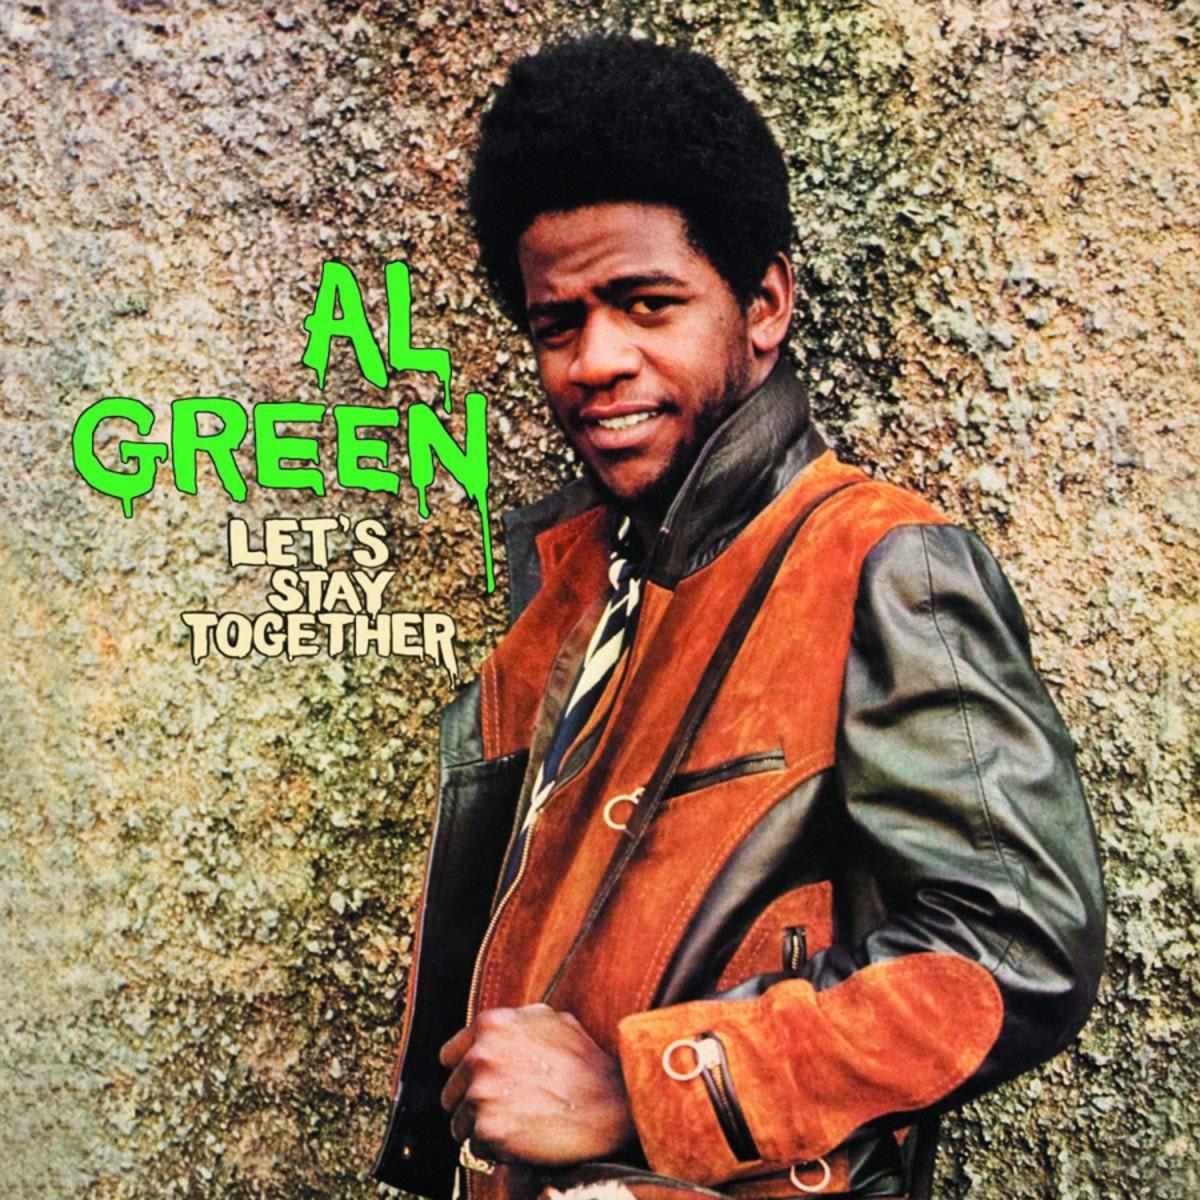 Al Green Let's Stay Together